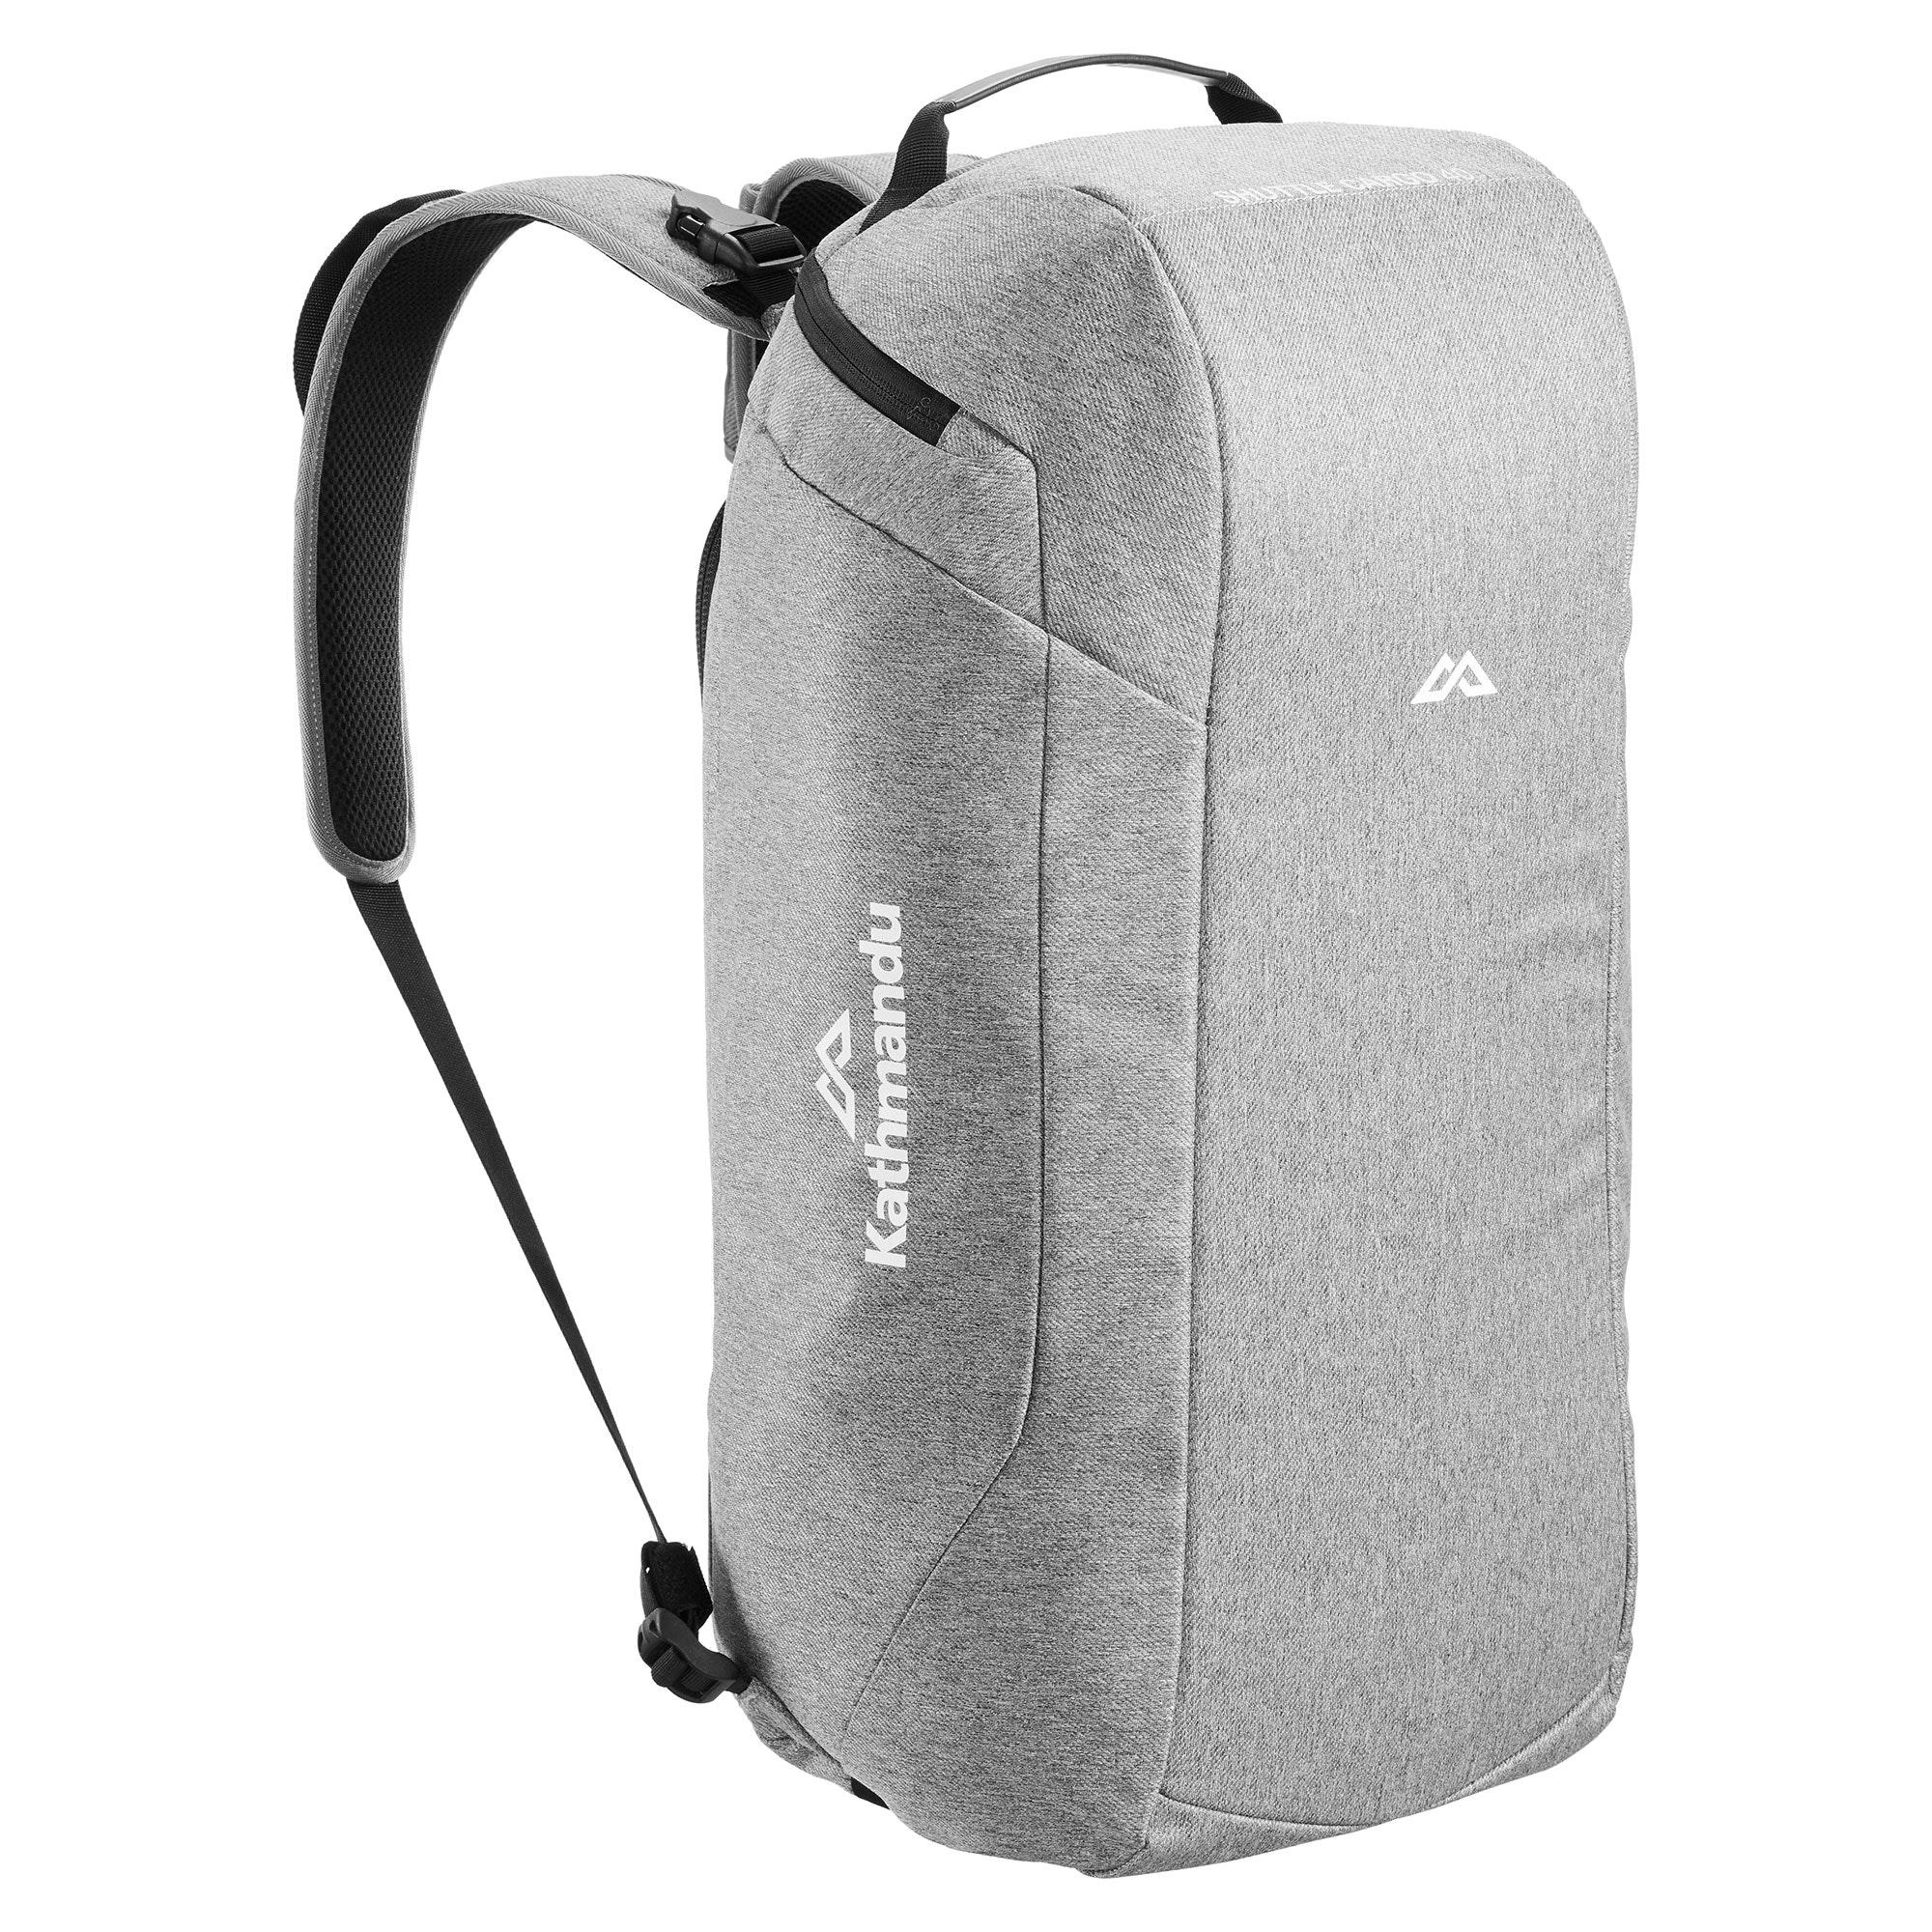 Kathmandu-Shuttle-Convertible-Travel-Backpack-Duffle-Cargo-Bag-40L-v4